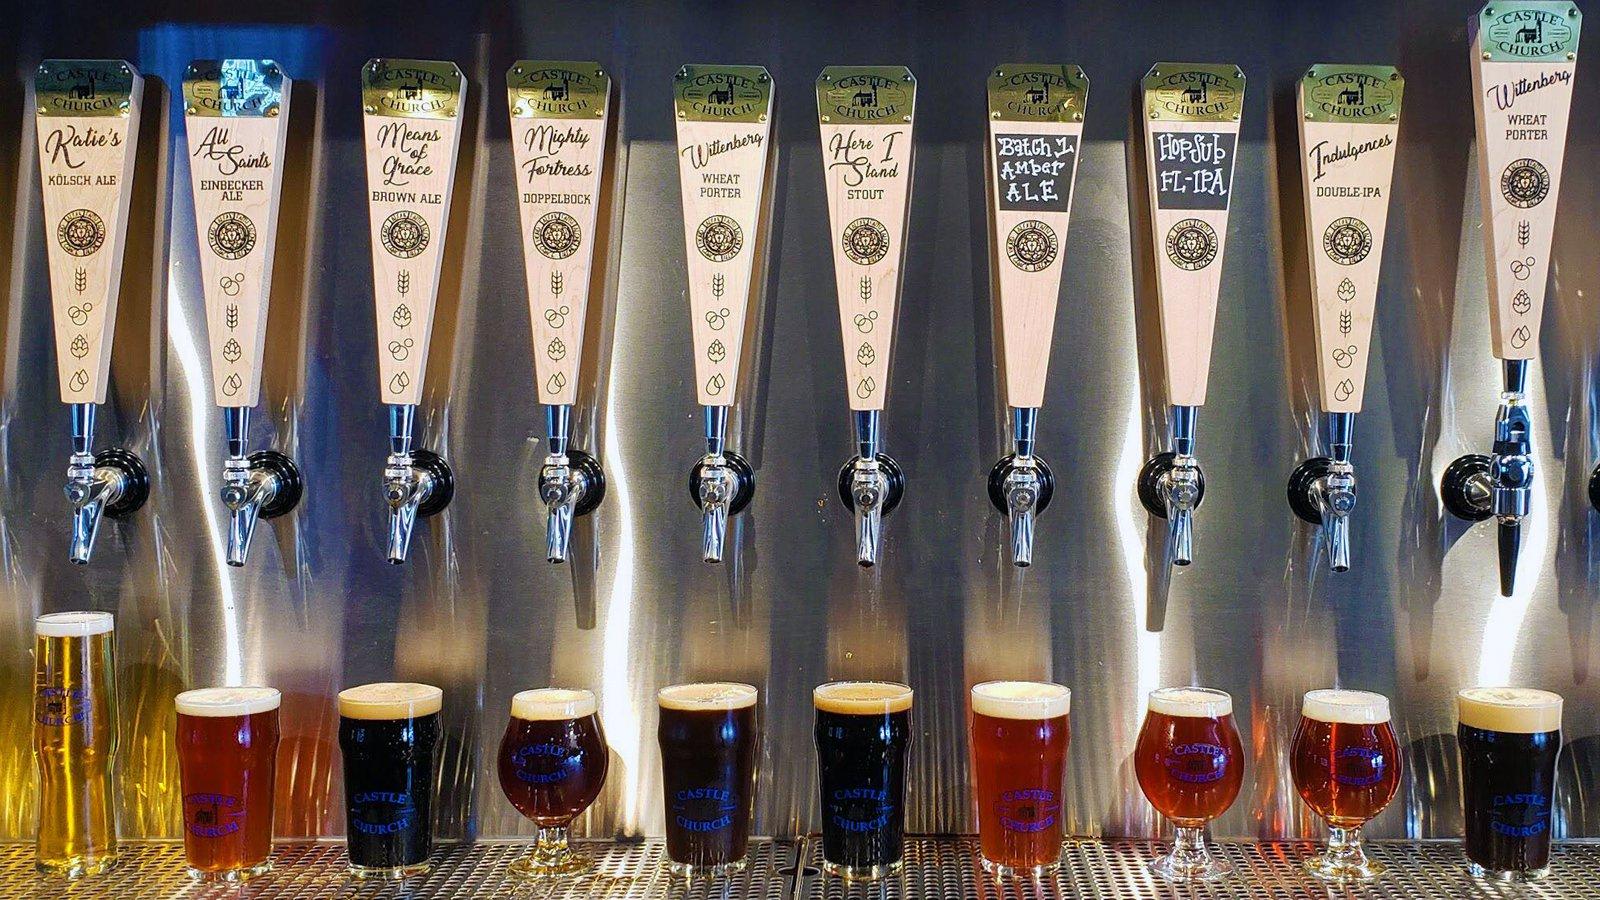 webRNS-Brewery-Church1-021219.jpg